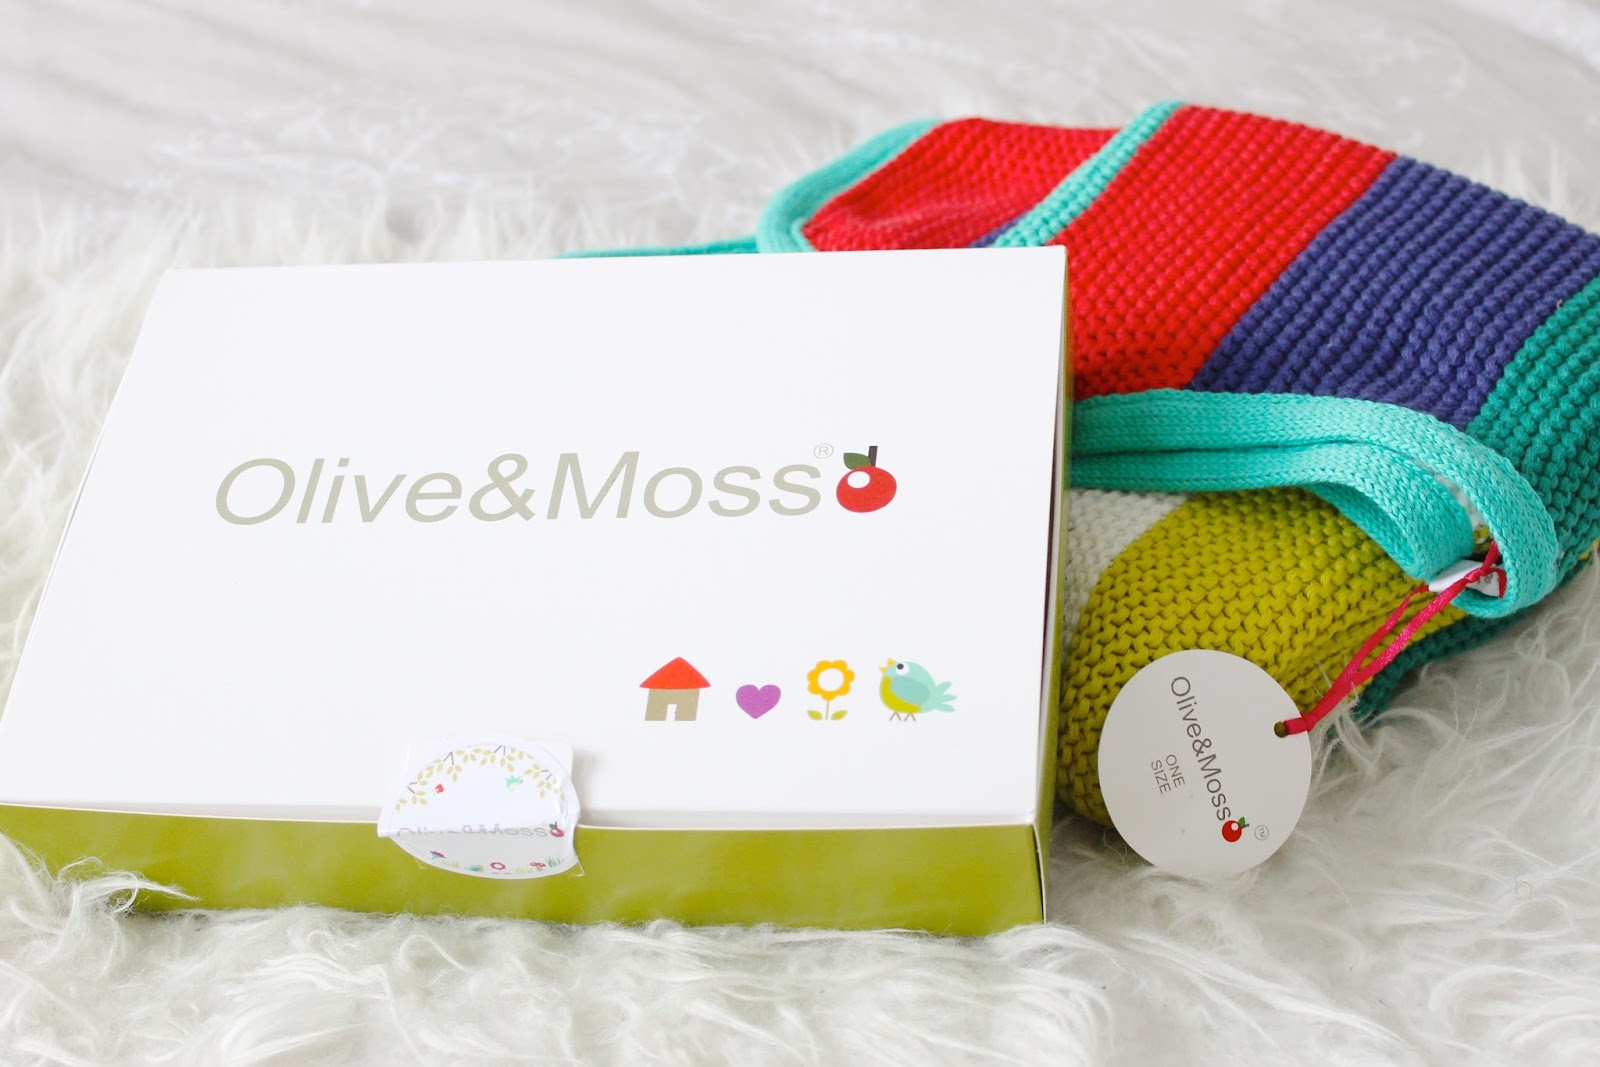 Olive & Moss newborn hamper